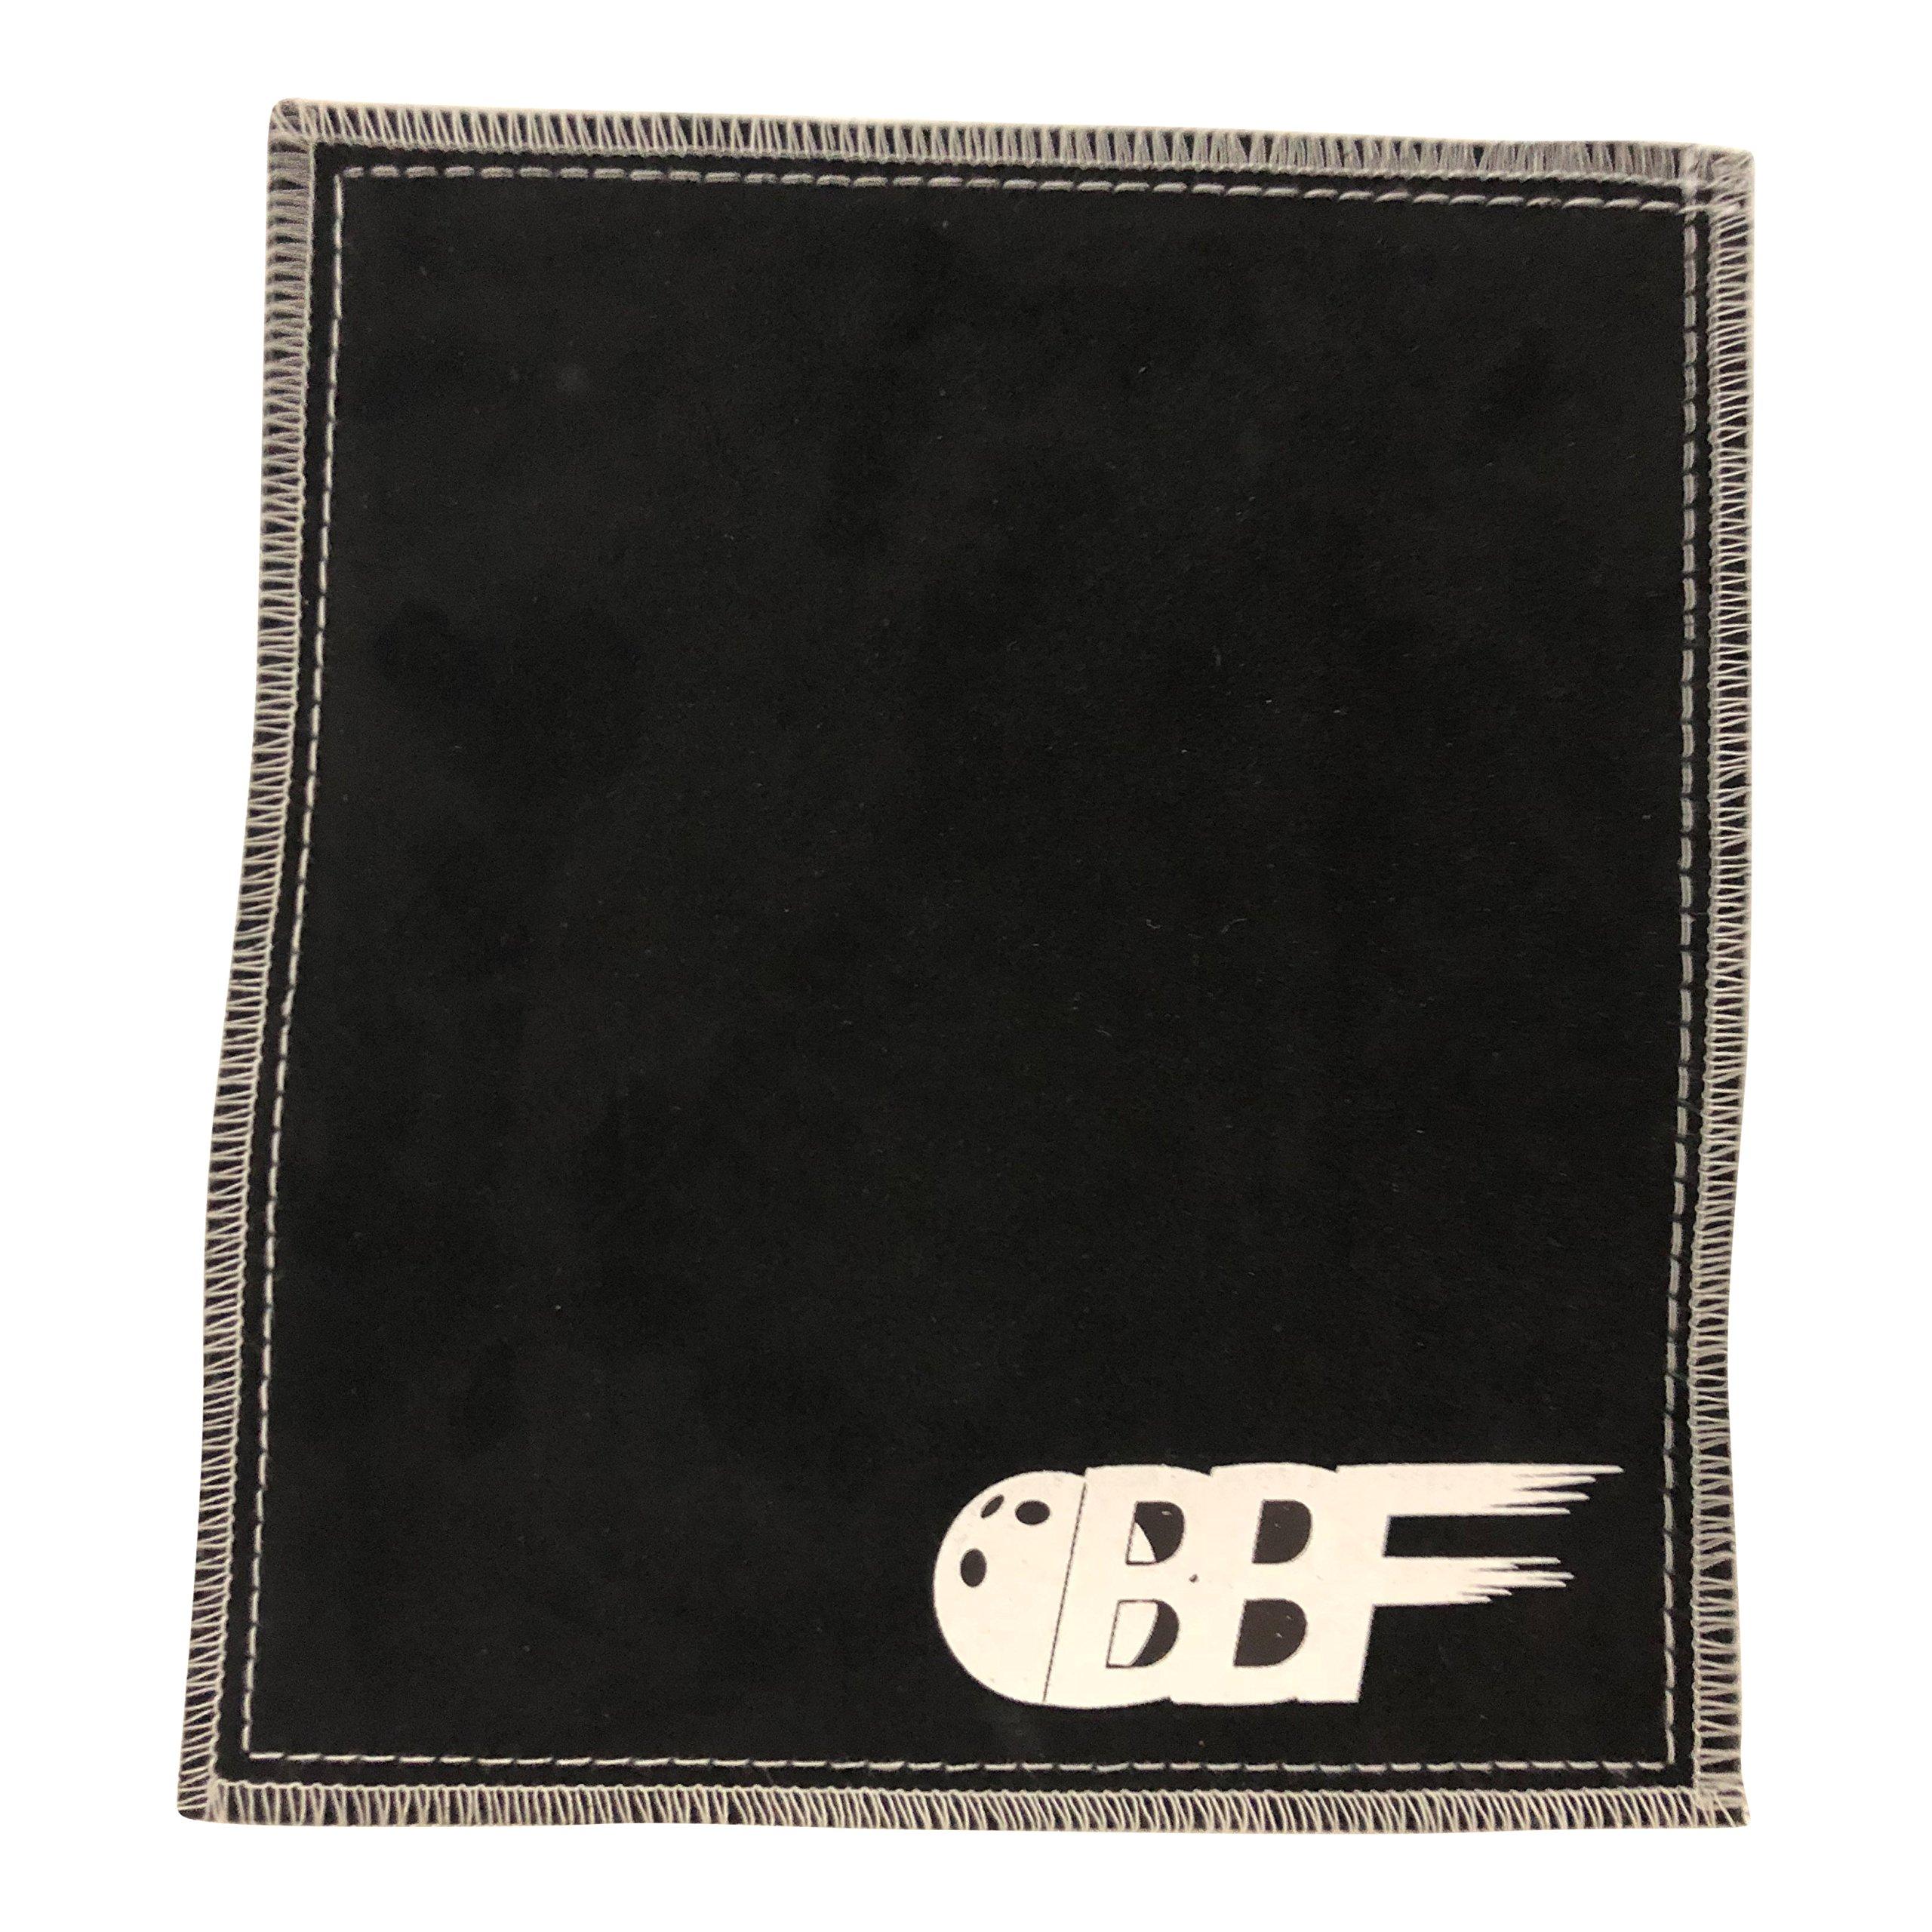 bowlingballfactory.com Ultra Tac Double Sided Black Leather Bowling Ball Shammy Pad Towel